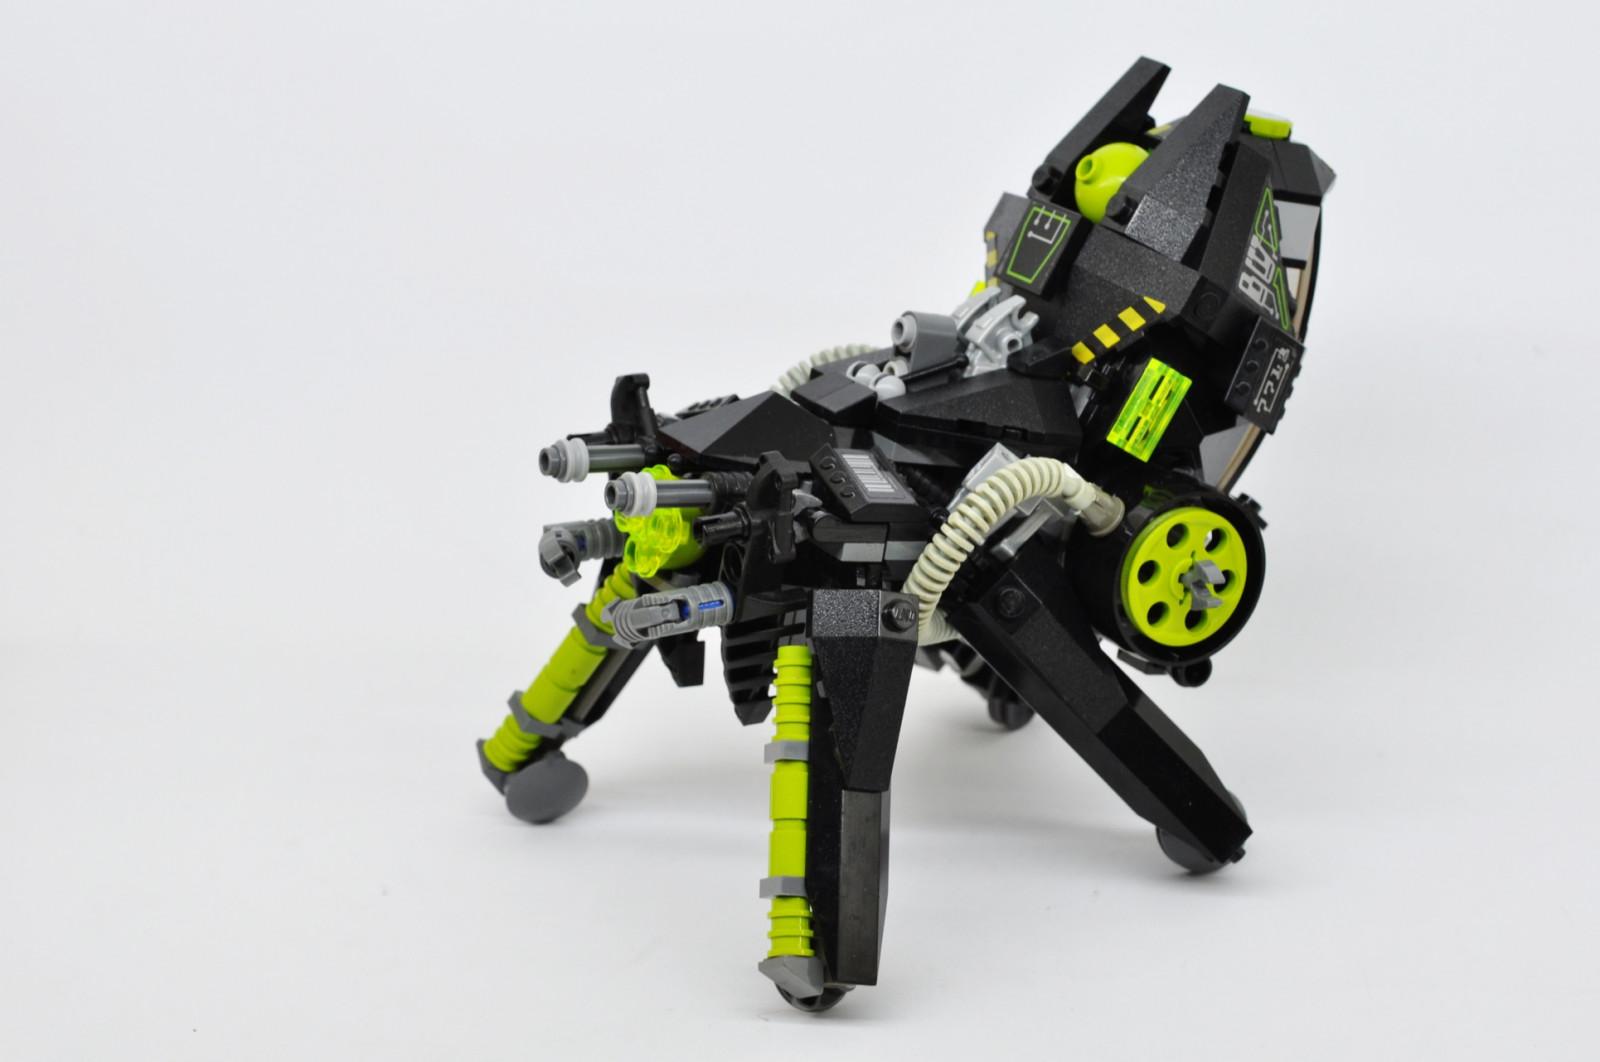 Robot Tank LEGO Mech Toy Machine Spider Cyber Tachikoma Future Mecha Marchikoma Lugindonesia Sifi Moclego Product